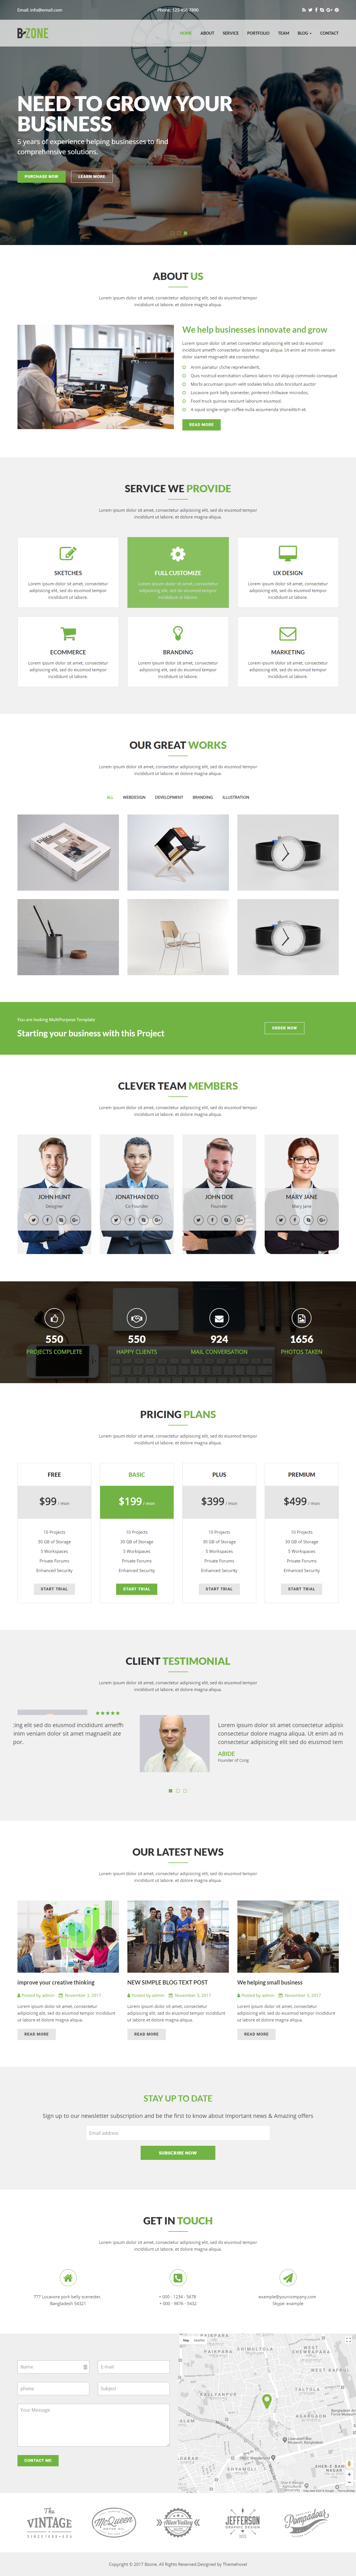 BZONE Multipurpose e Page HTML5 Template